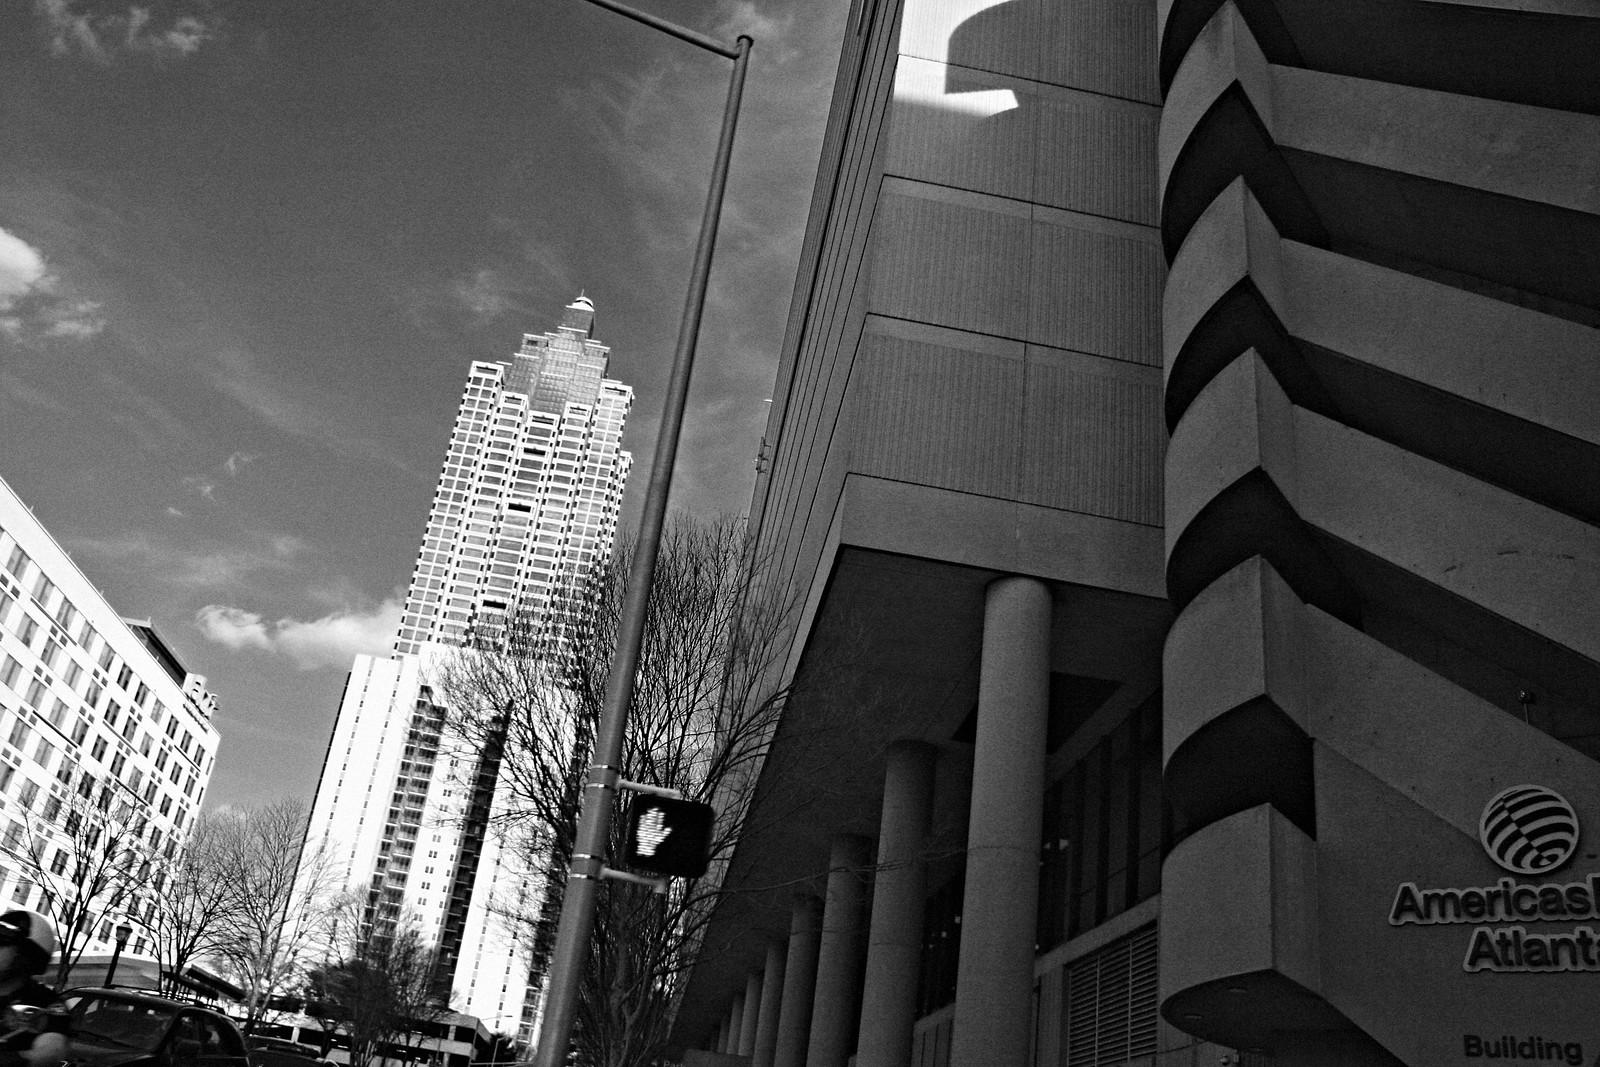 AmericasMart Atlanta, 2015